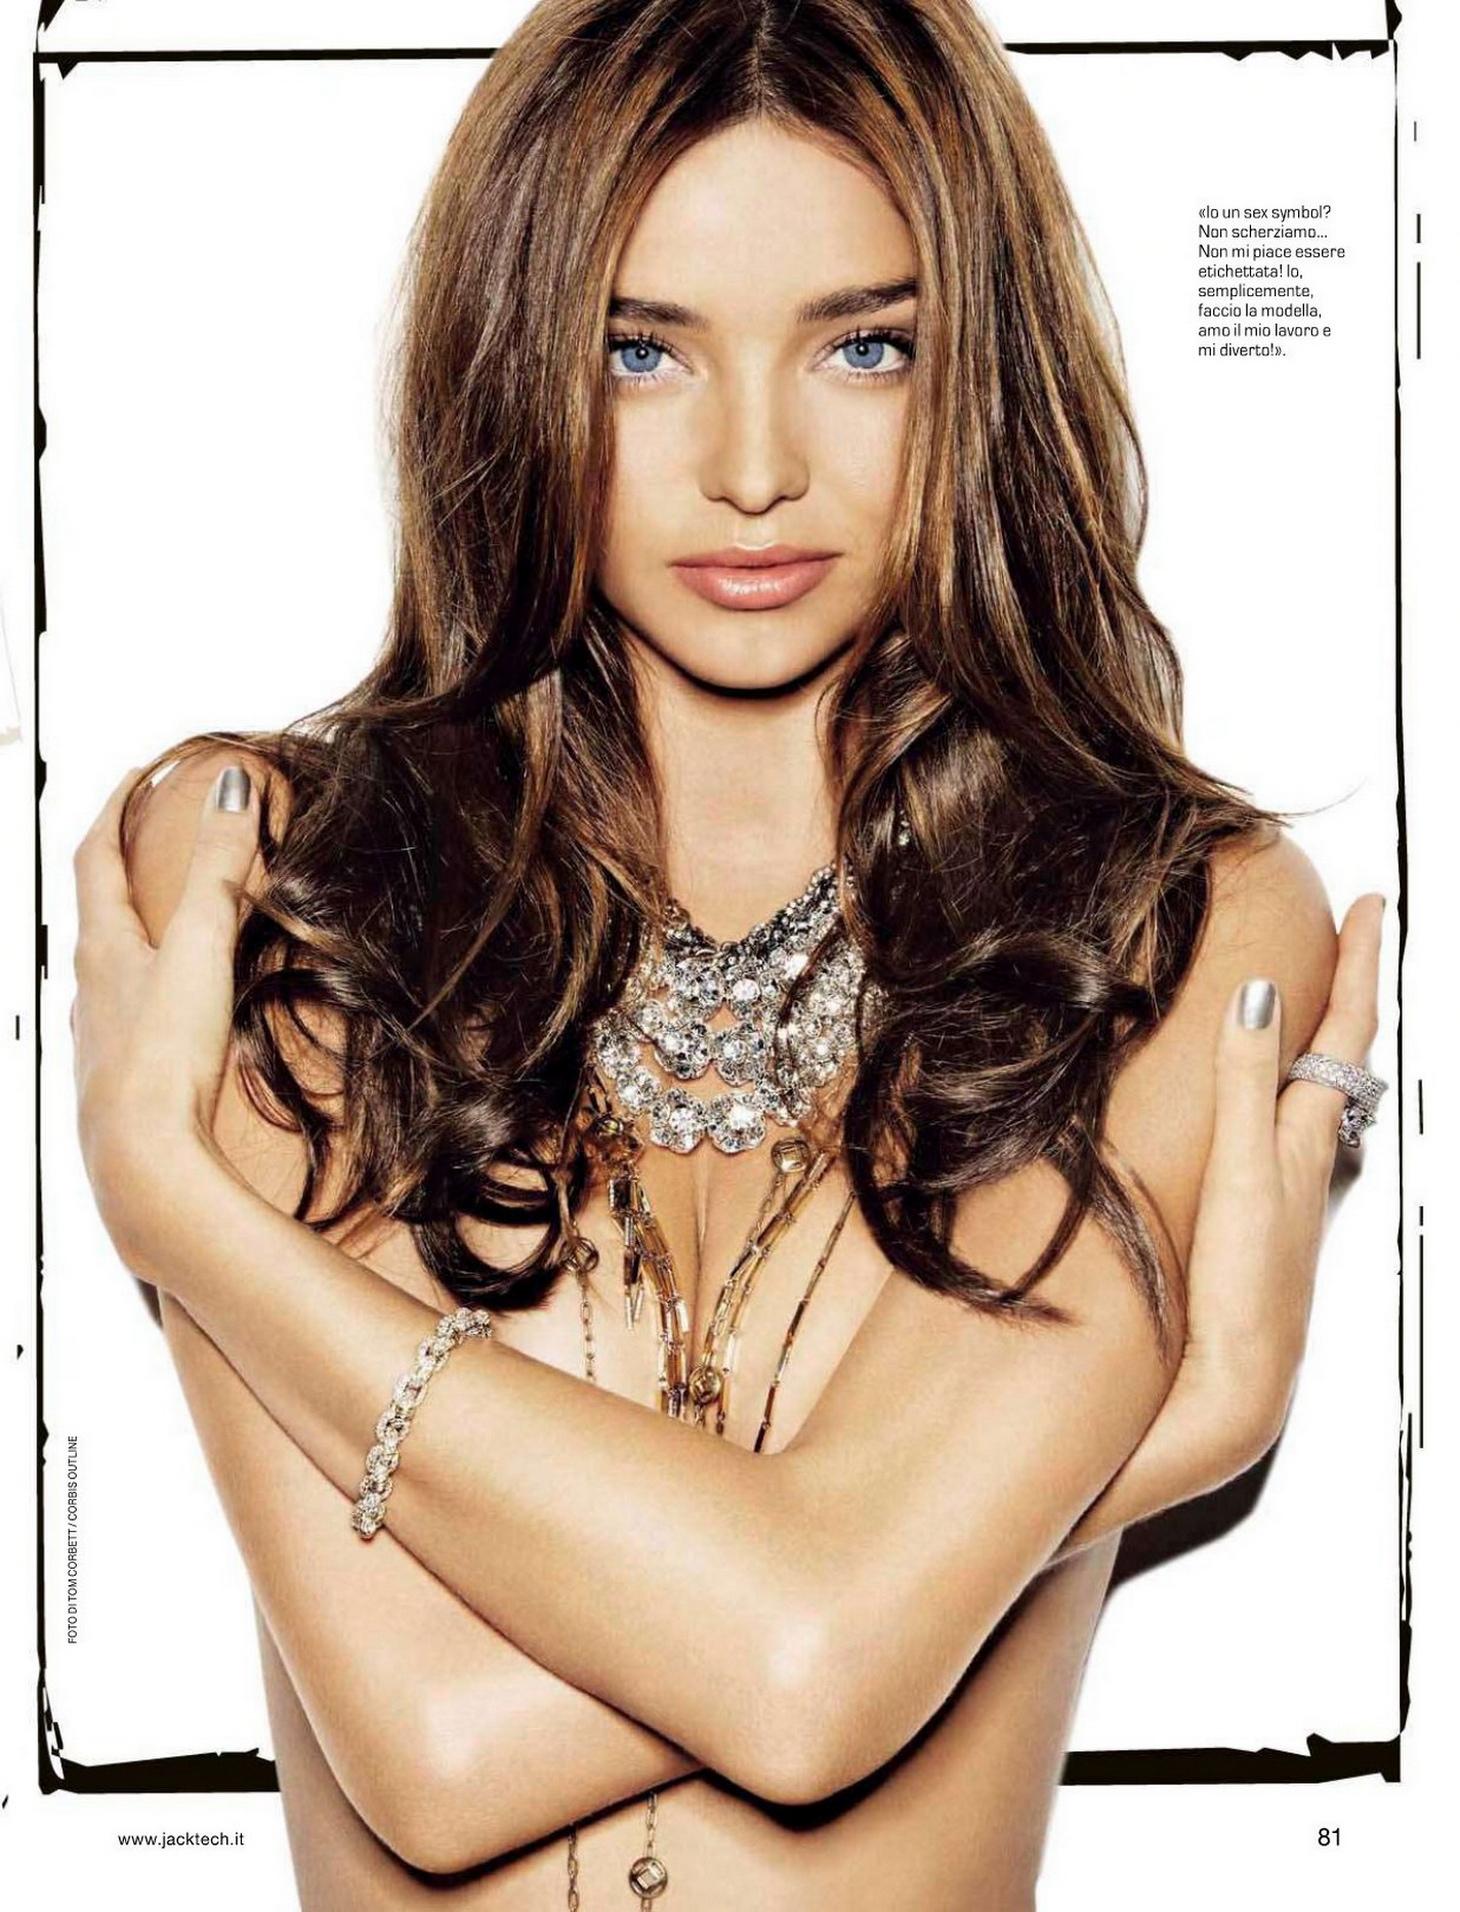 87533_miranda_kerr_jack_magazine-1_122_360lo.jpg